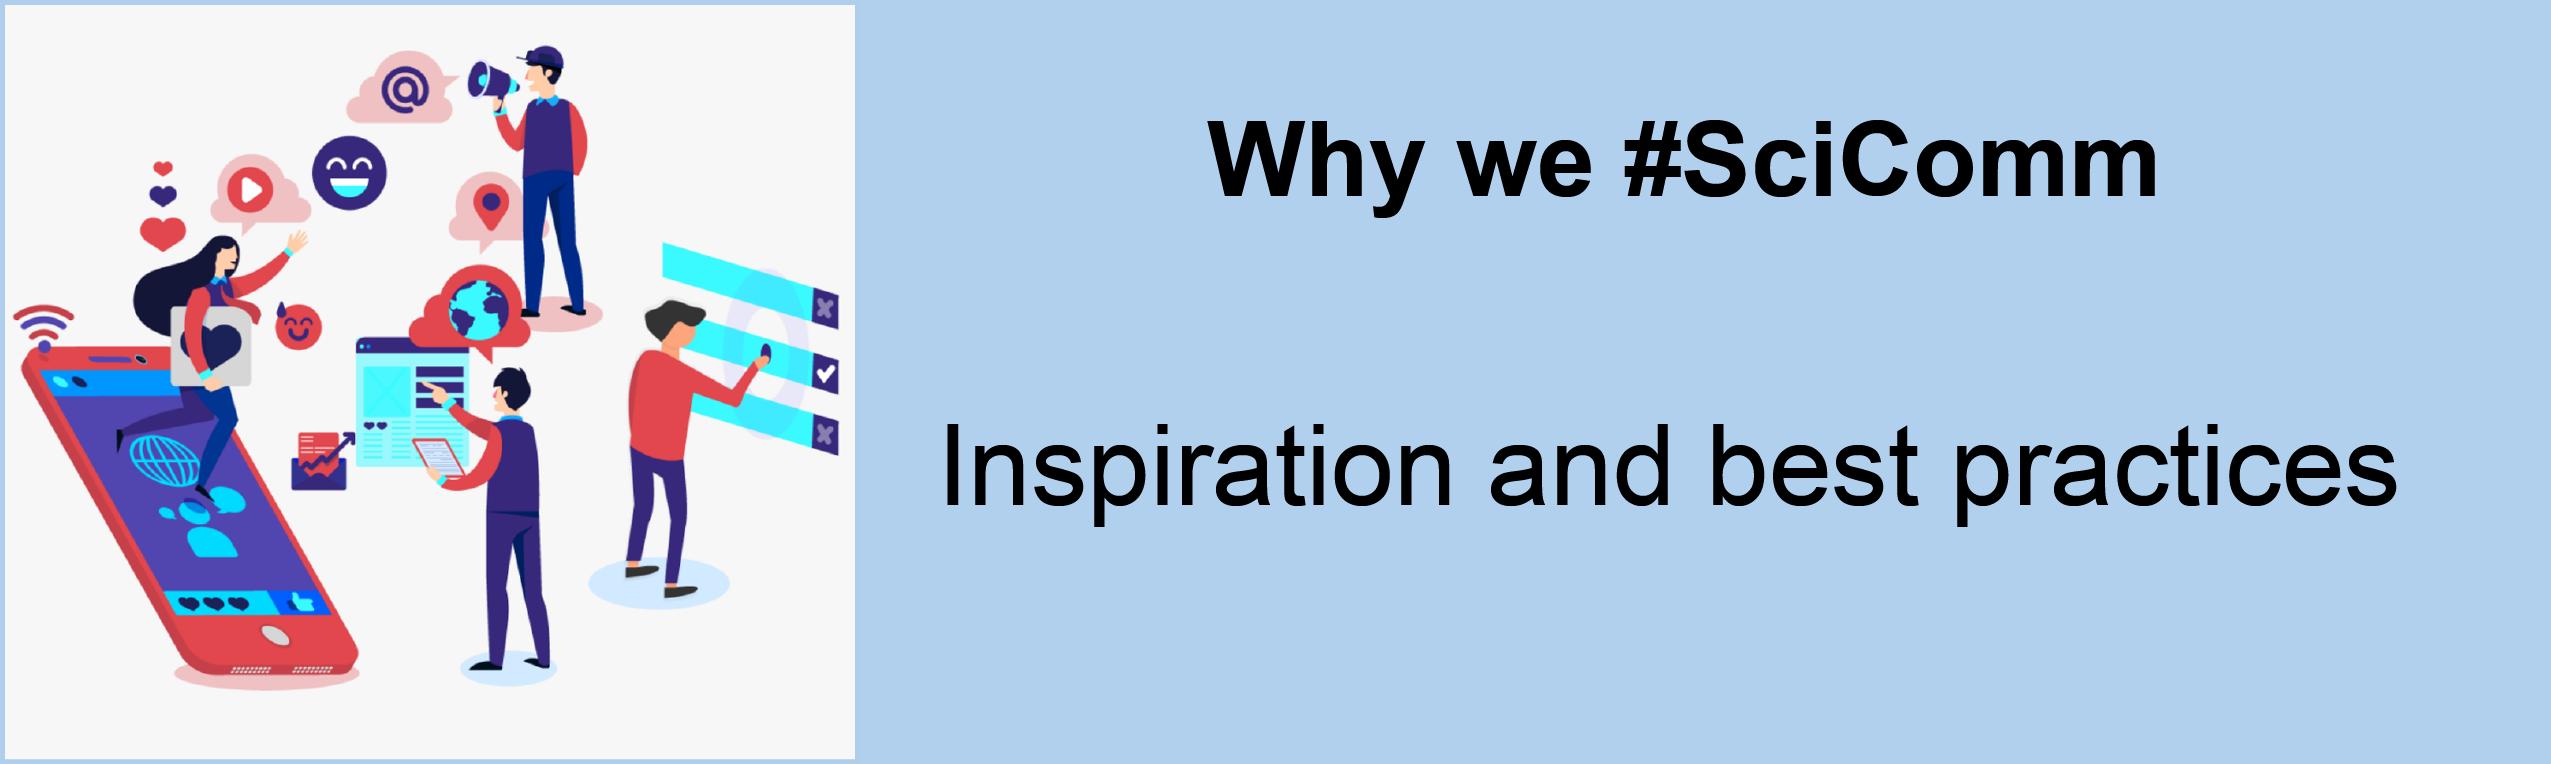 Why we #SciComm